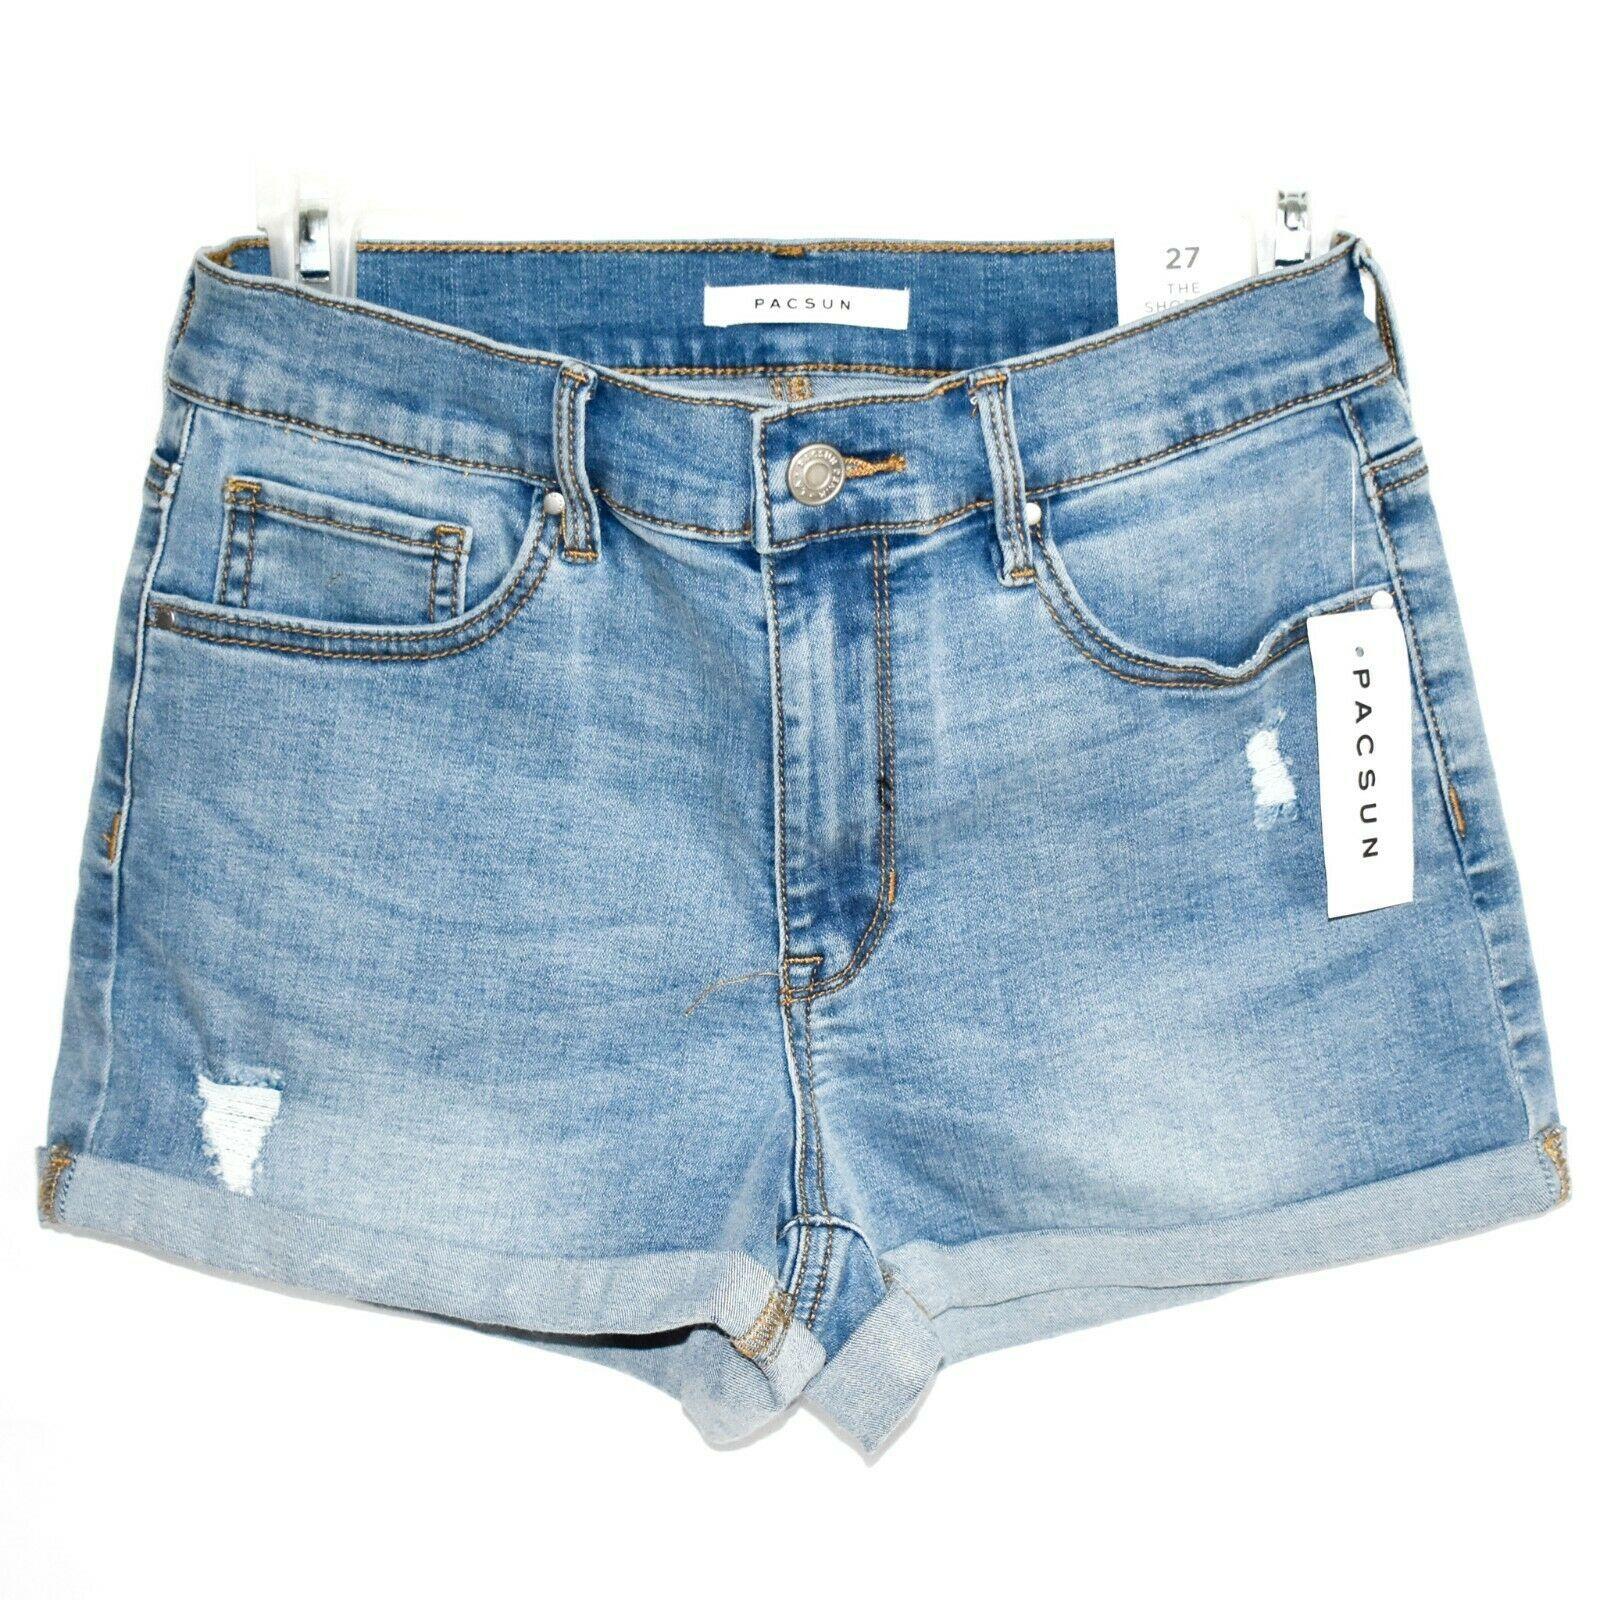 PacSun Rebecca Blue Denim Medium Indigo Shortie Shorts Size 27 New w Tags